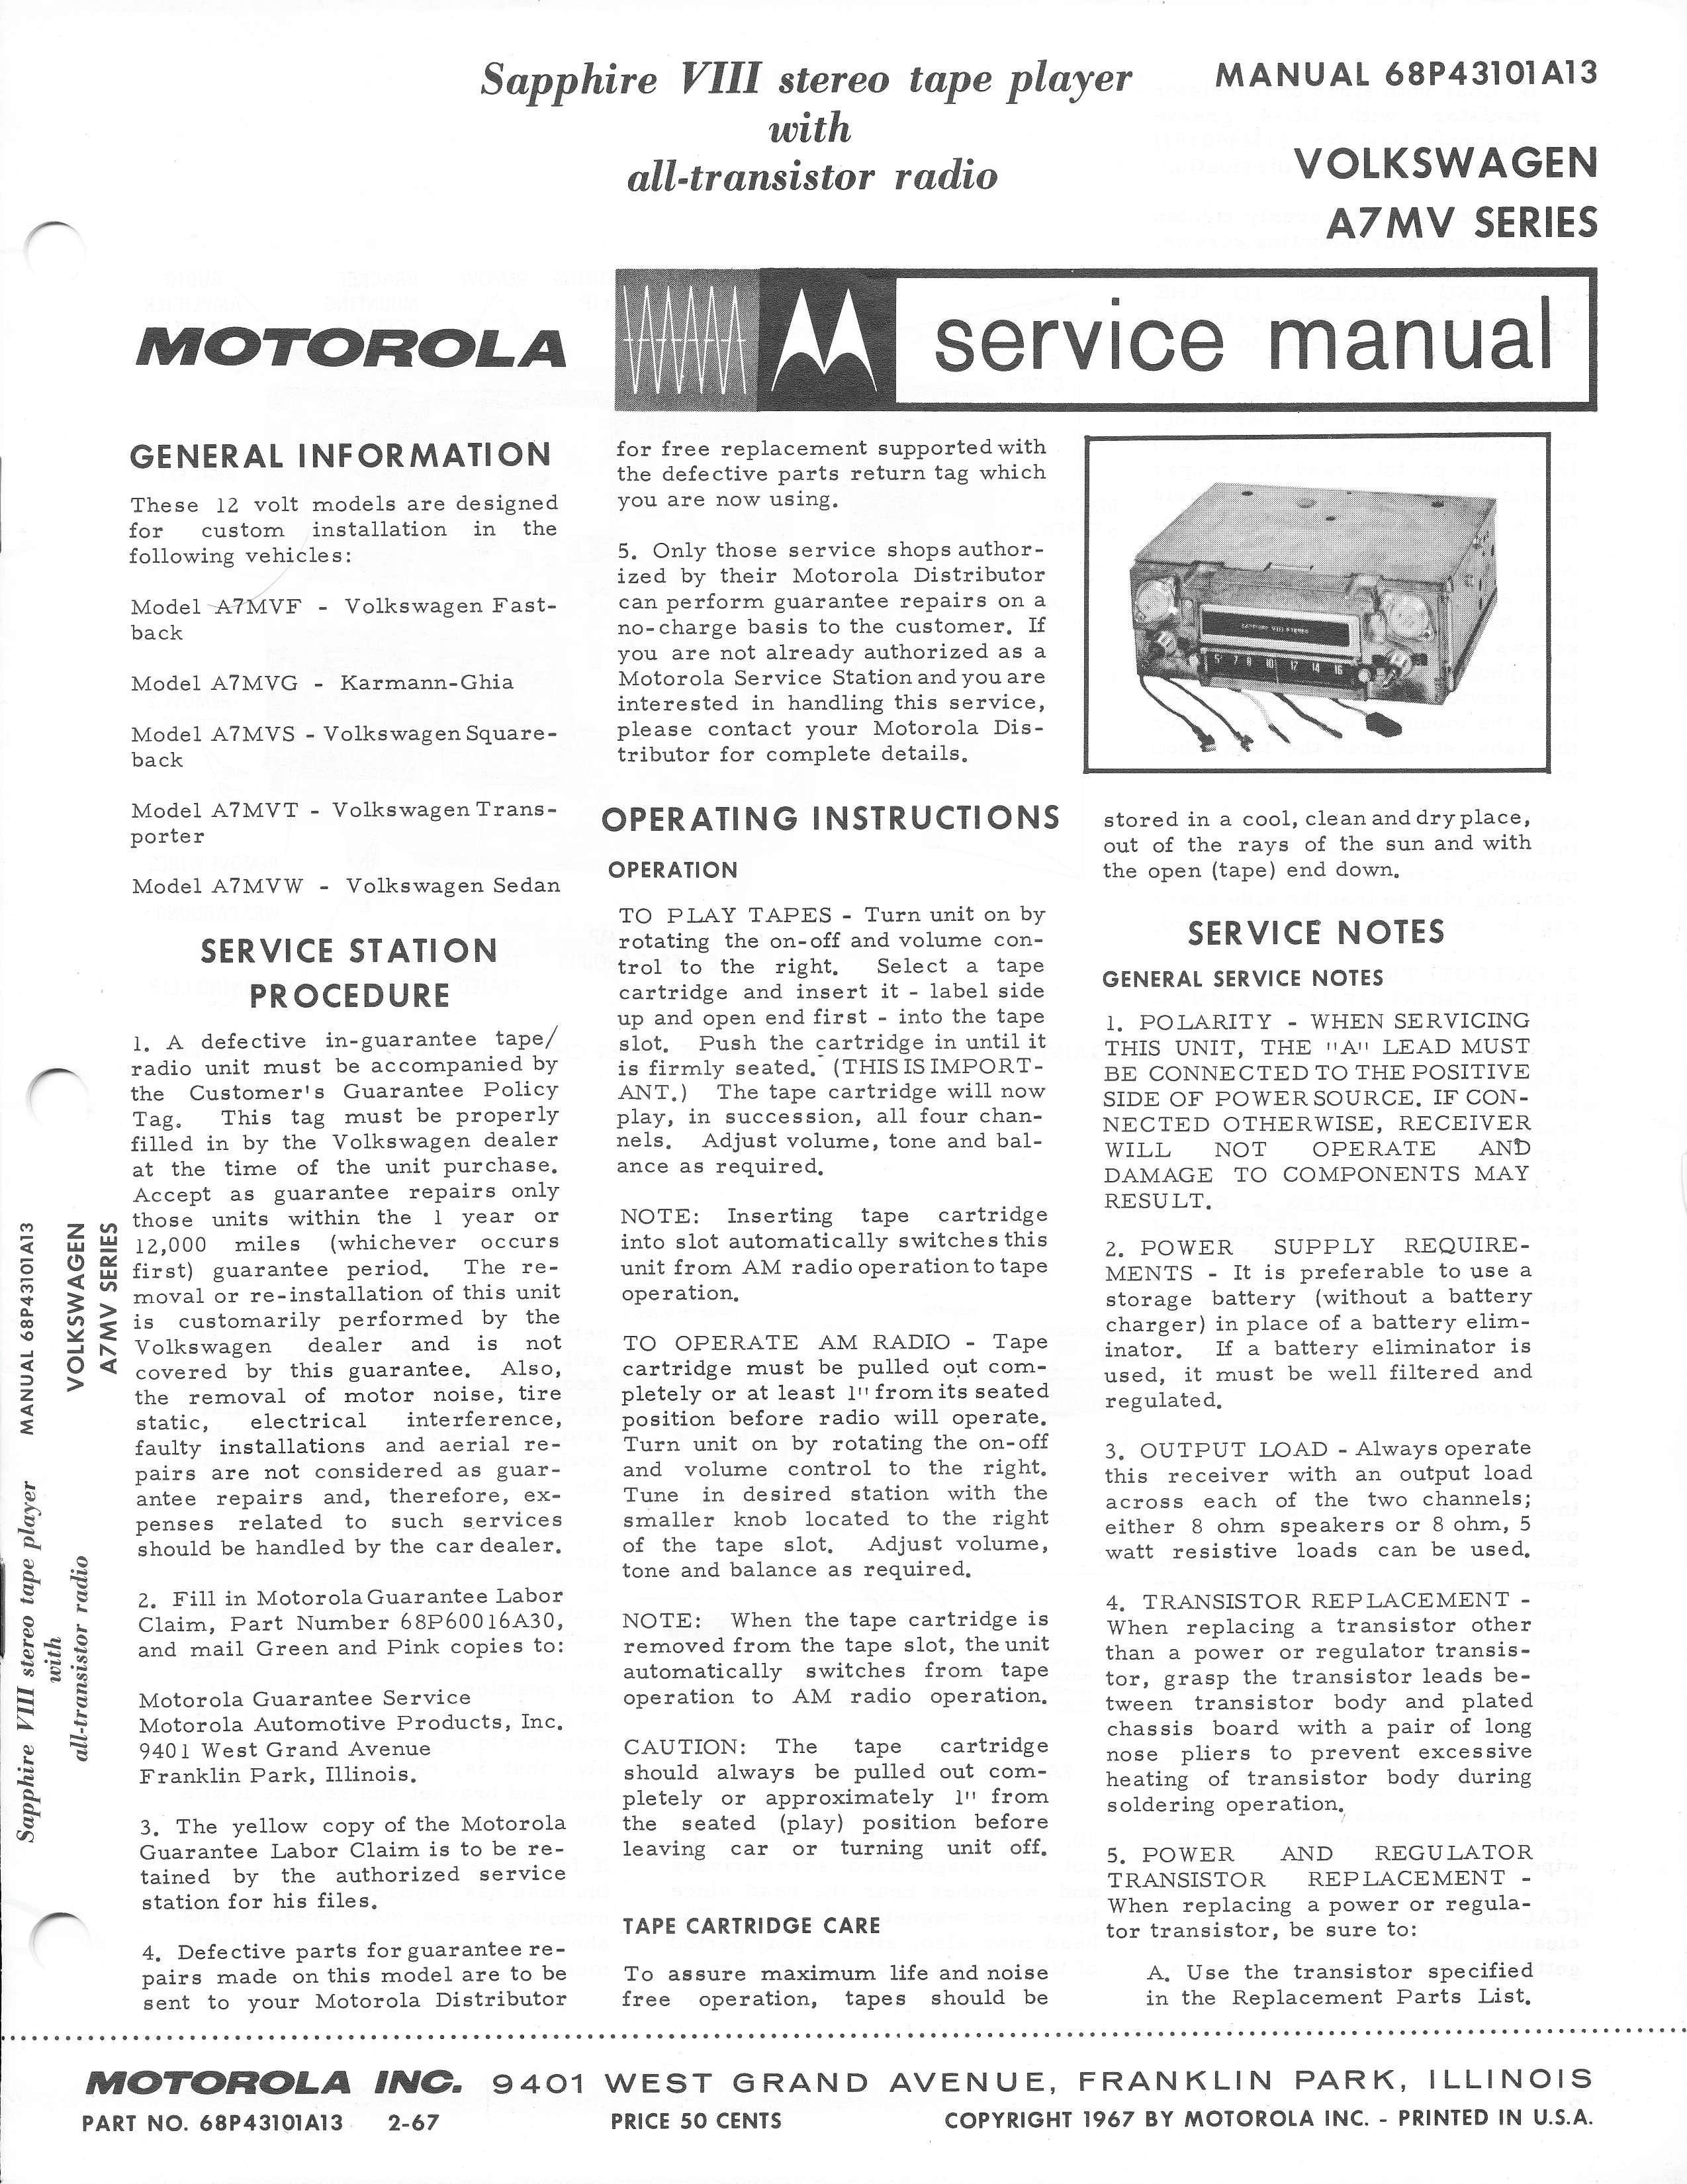 acls provider manual 2011 pdf free download